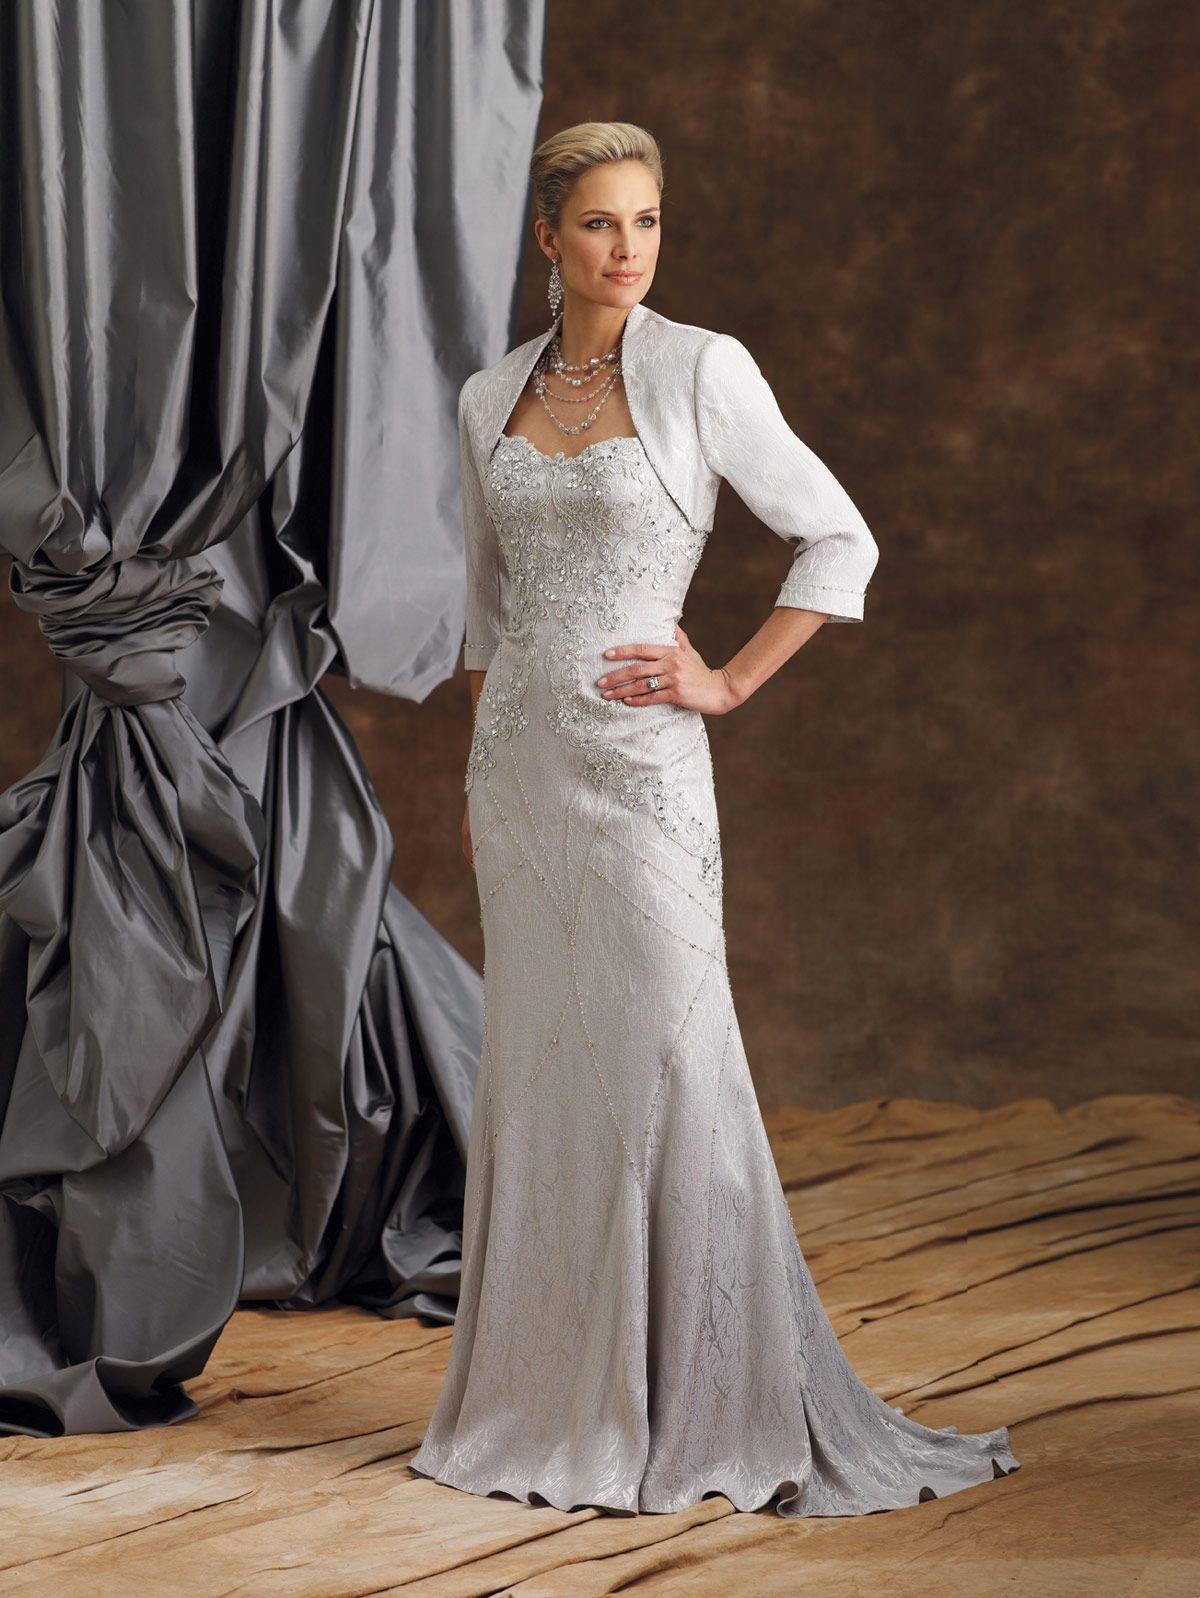 Twopiece jacquard dress set, strapless sweetheart mermaid